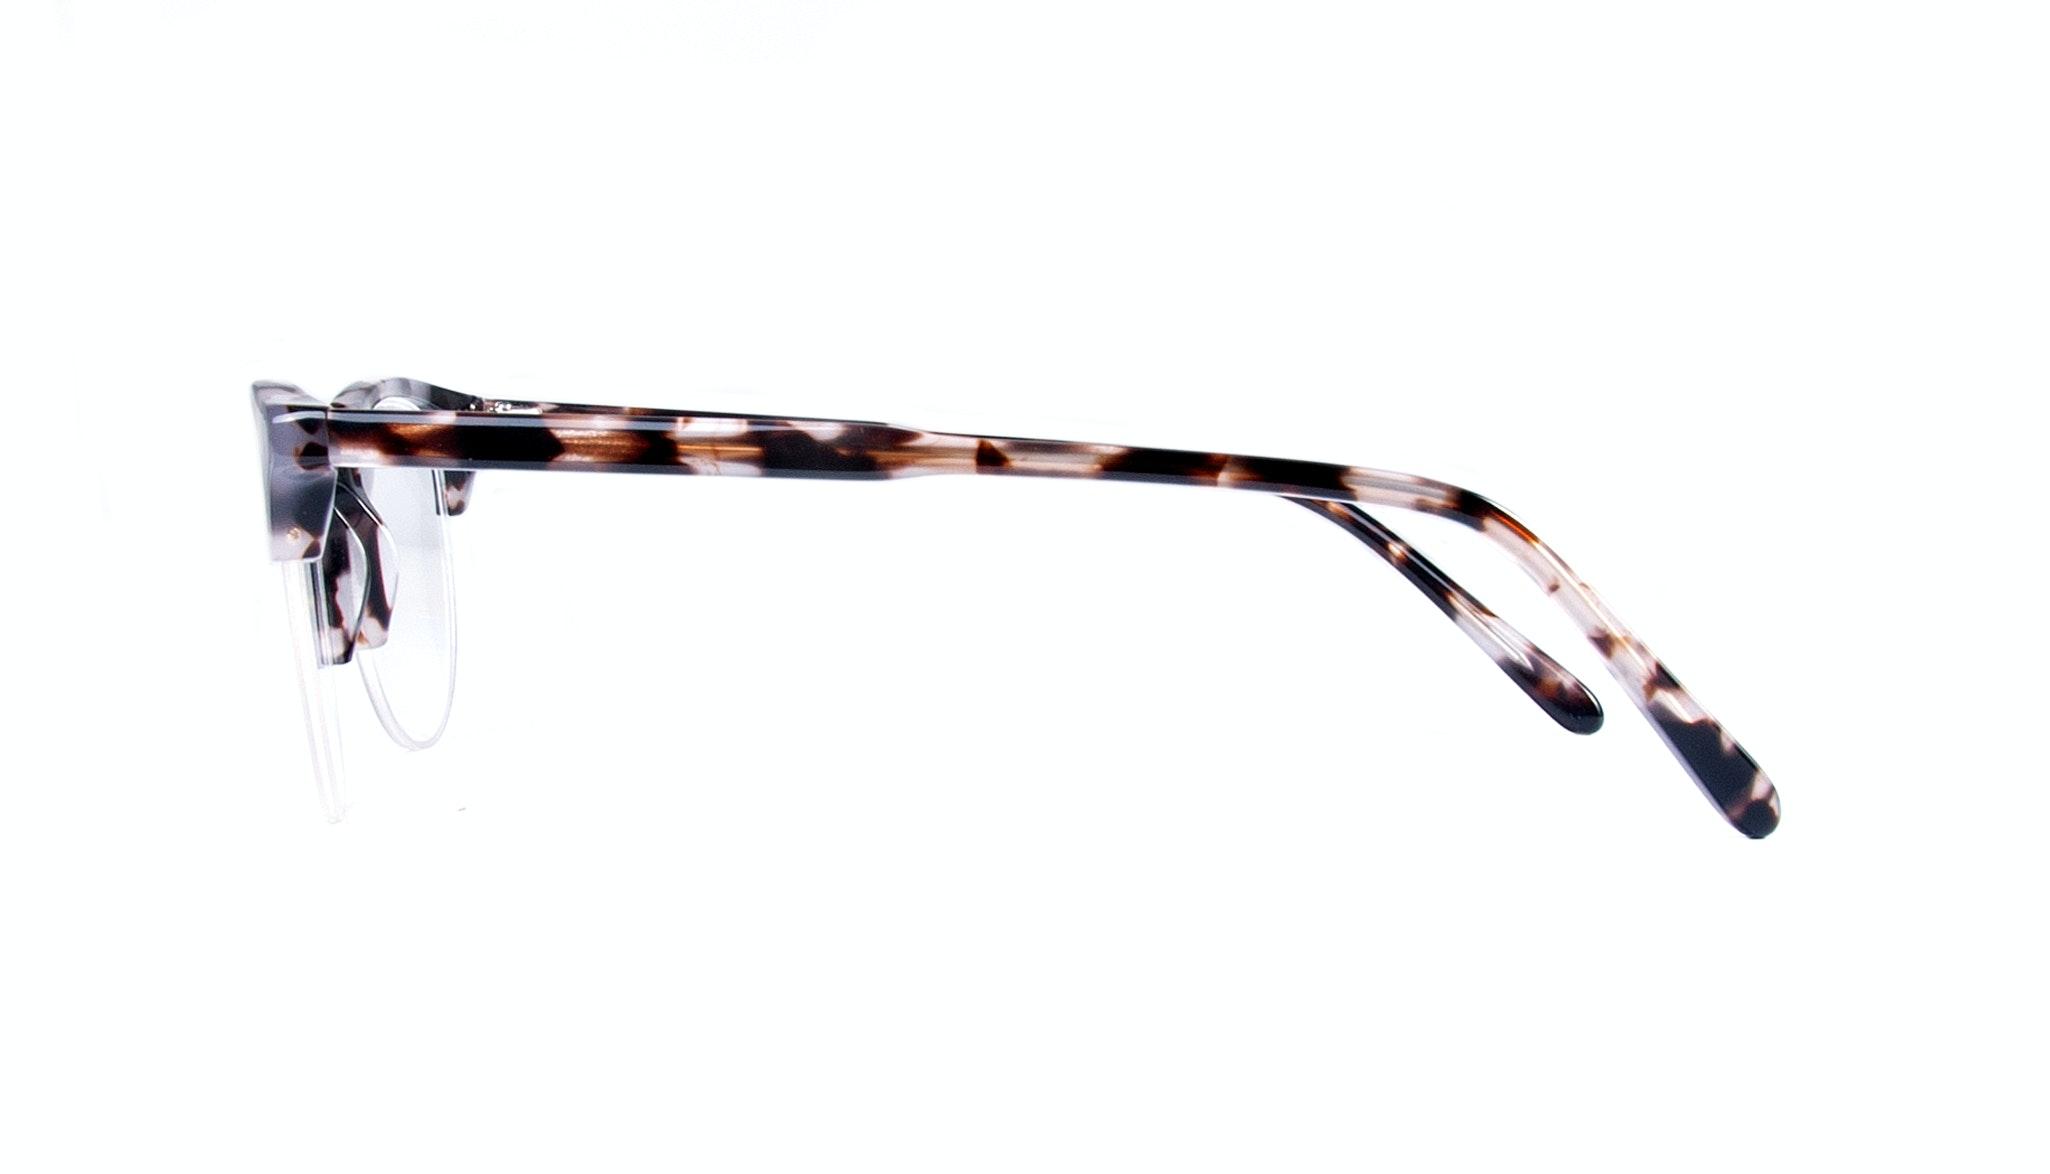 Affordable Fashion Glasses Round Semi-Rimless Eyeglasses Women Cult Light Mocha Tortoise Side